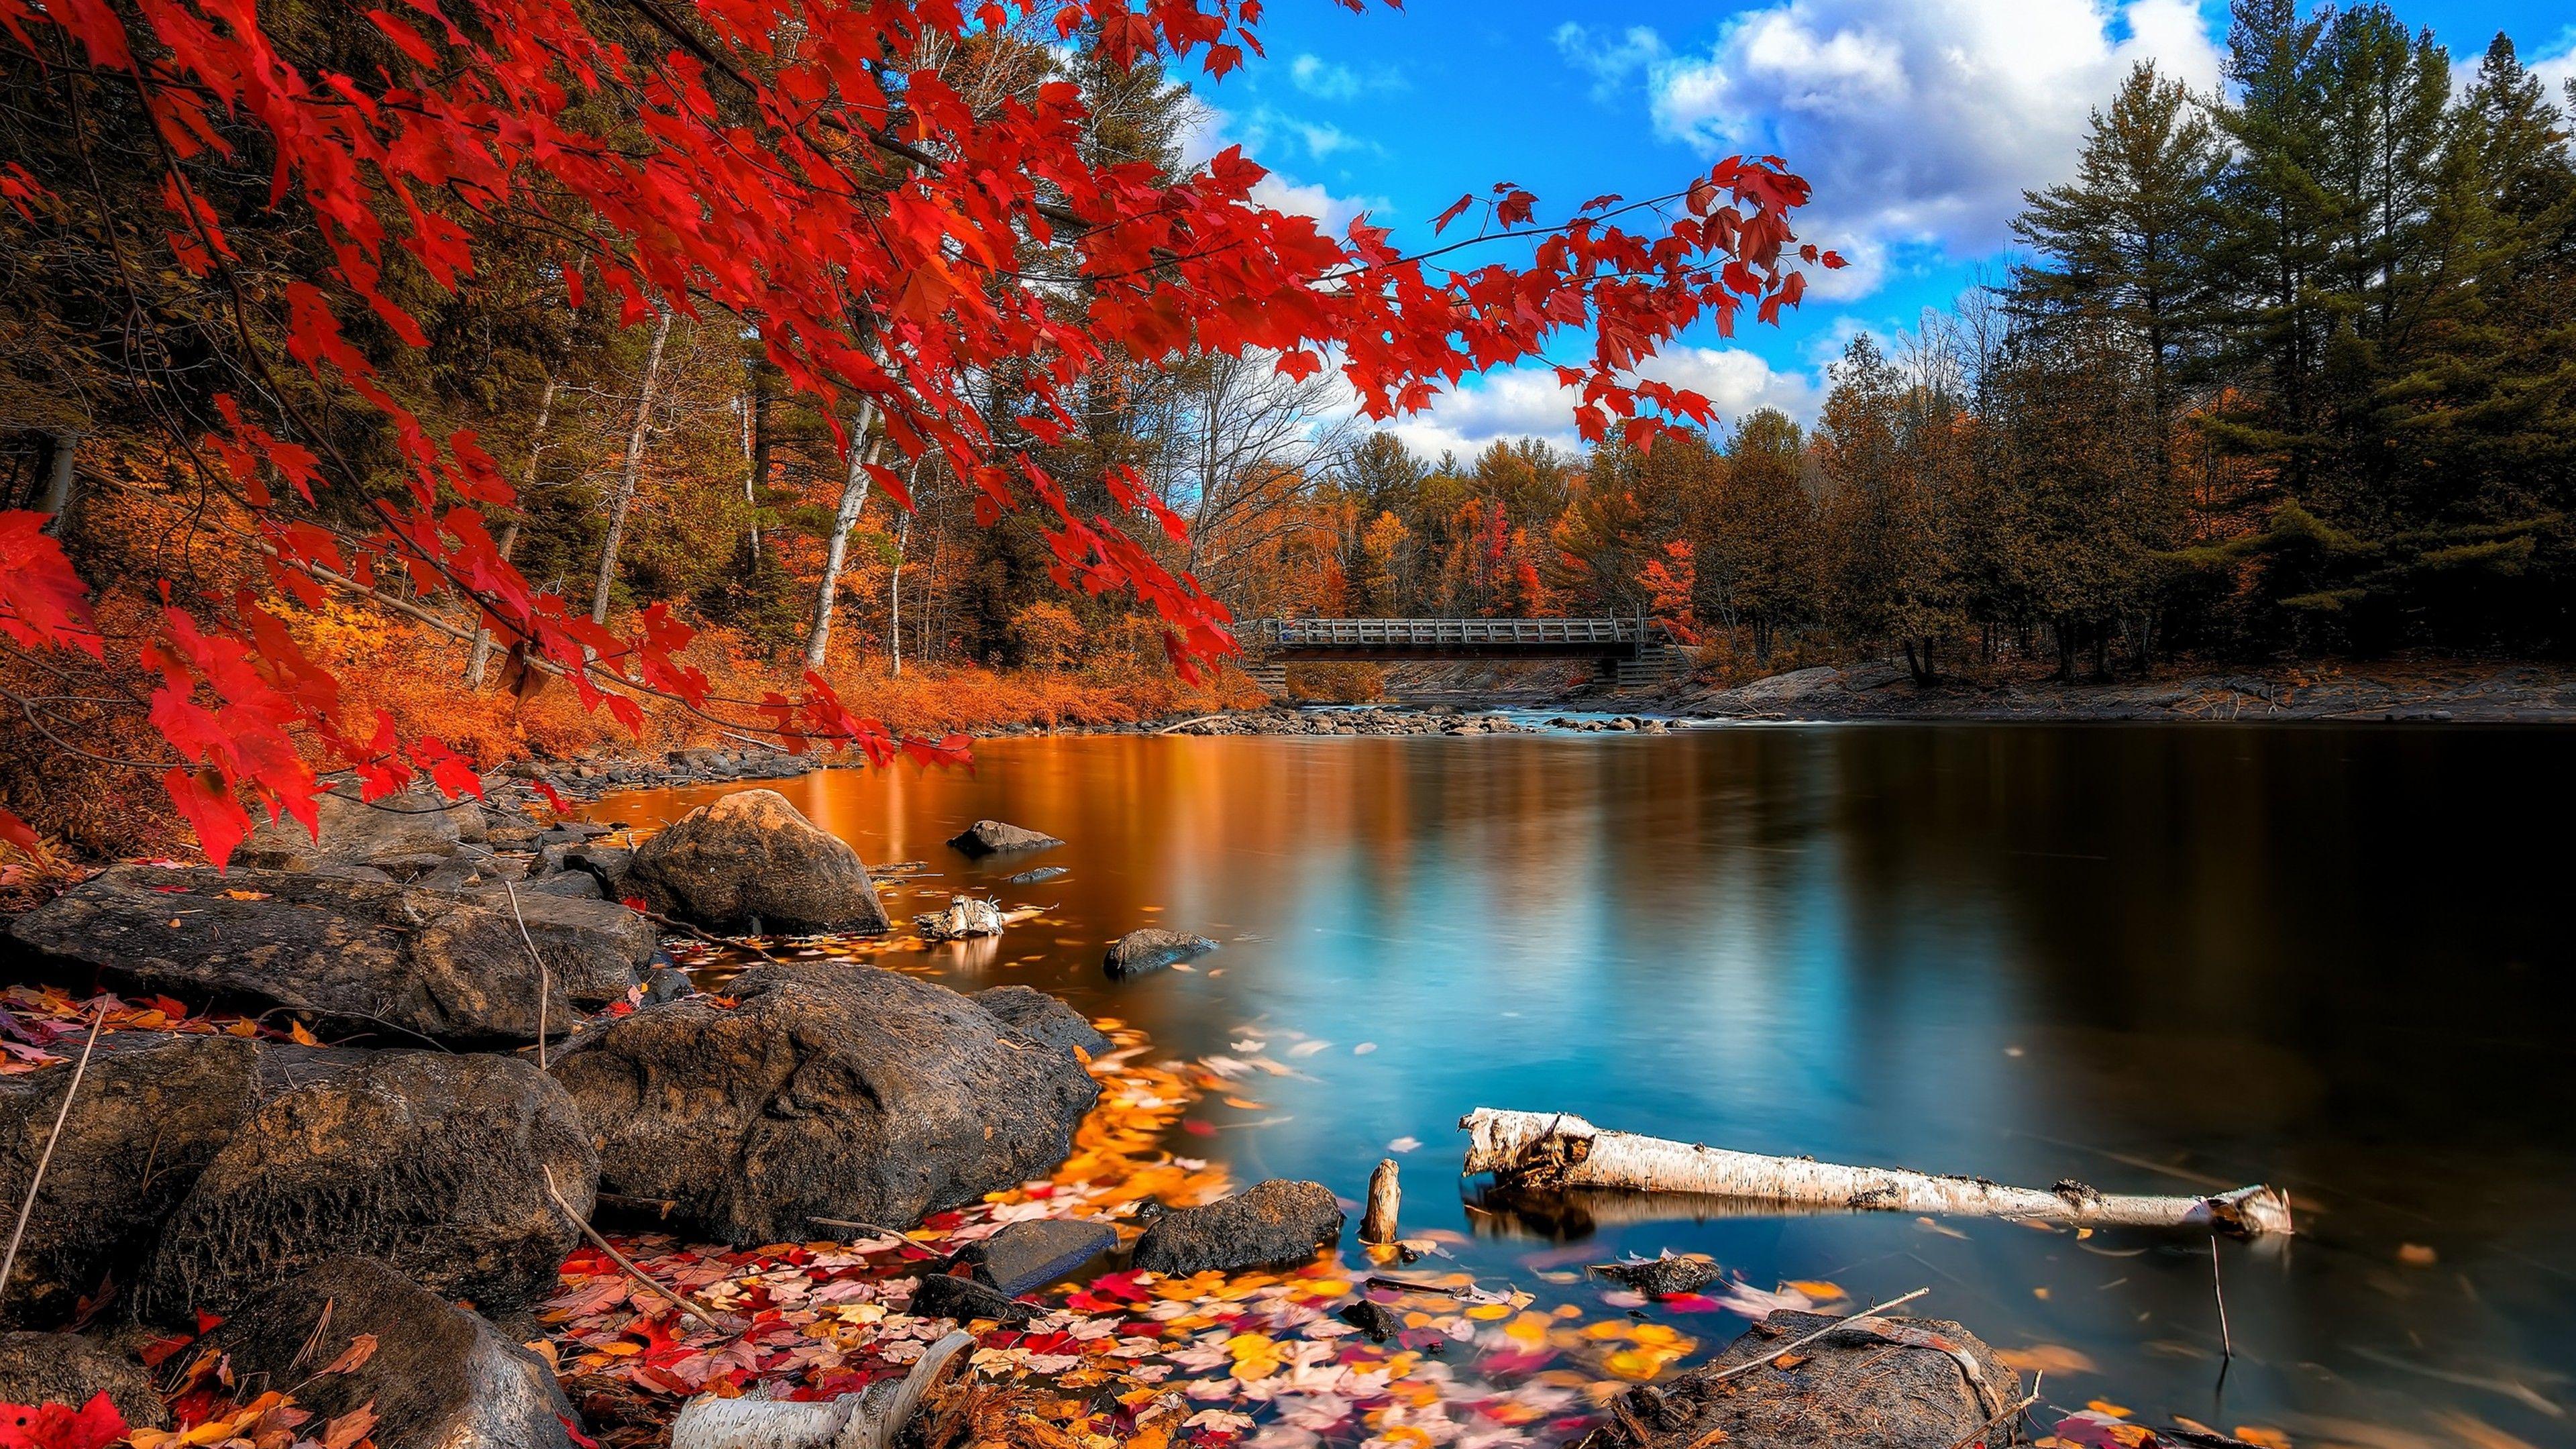 Fall Foliage 4k Hd Wallpapers Autumn Scenery Nature Desktop Hd Nature Wallpapers